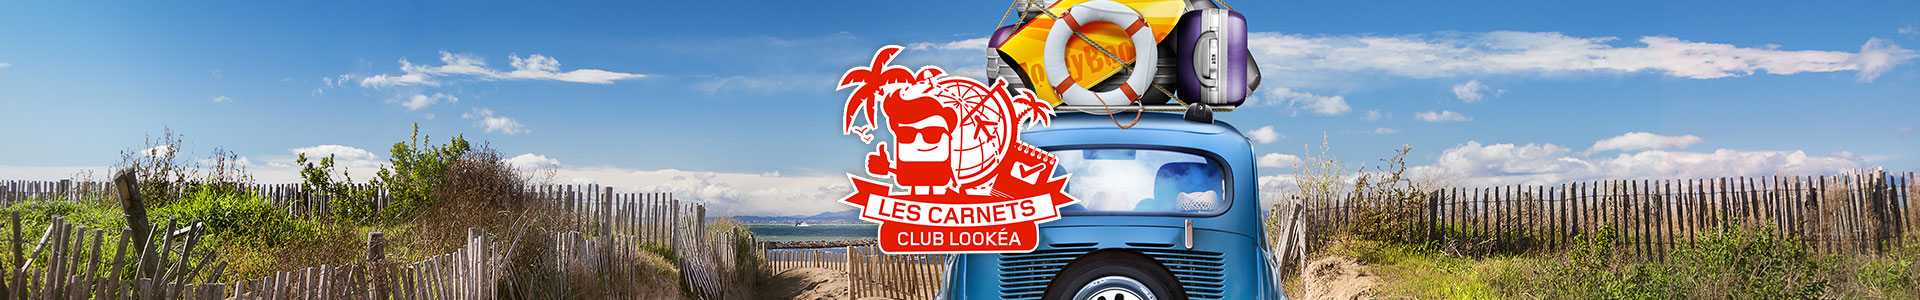 Les Carnets Club Lookéa